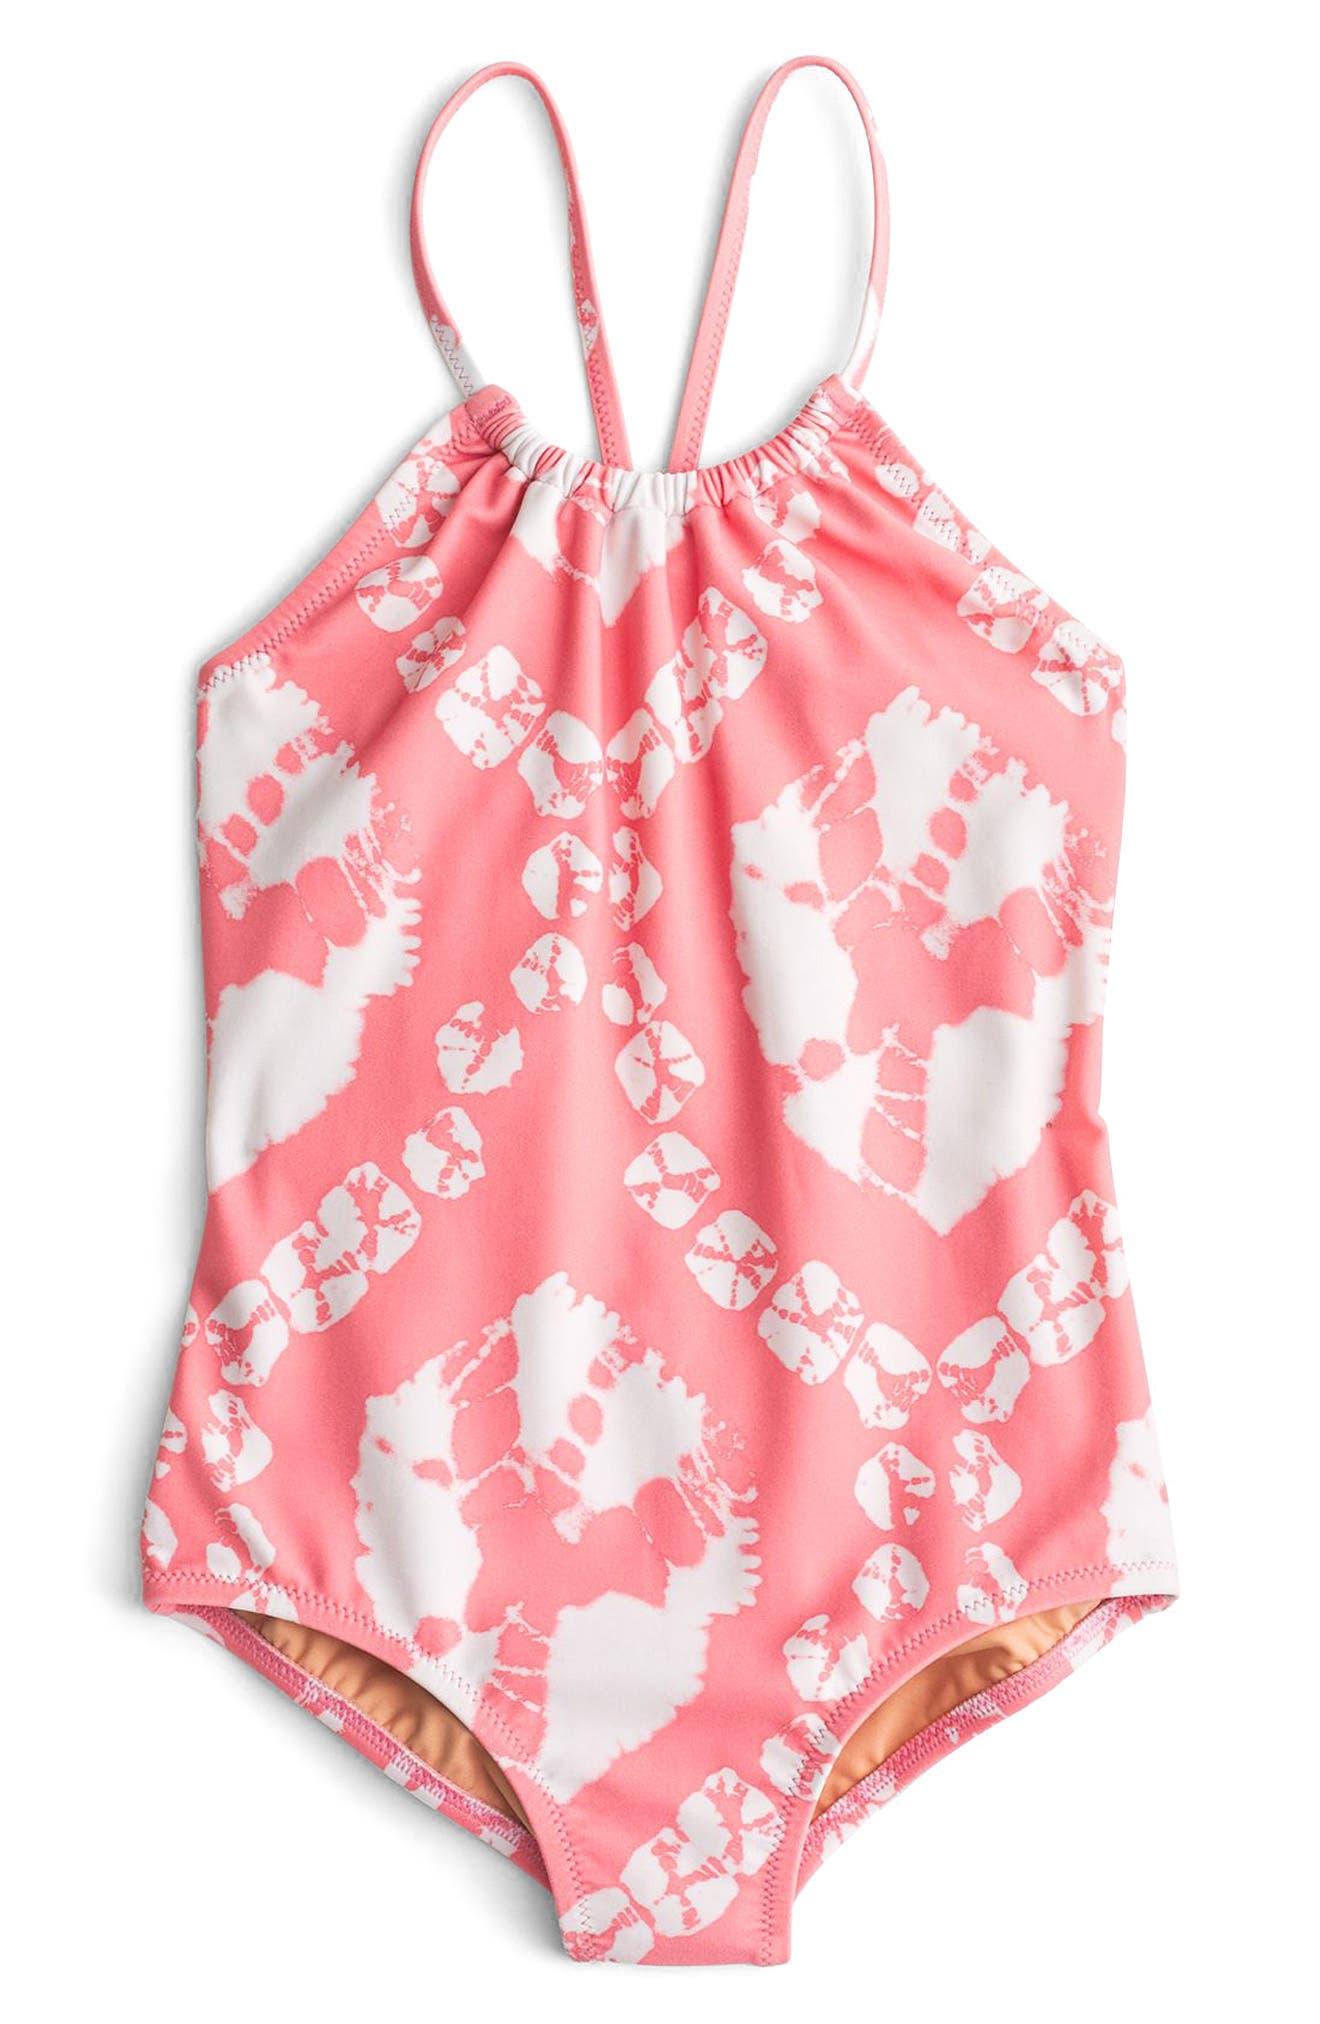 Tie Dye One-Piece Swimsuit,                         Main,                         color, Pink Orange Multi Ka3139